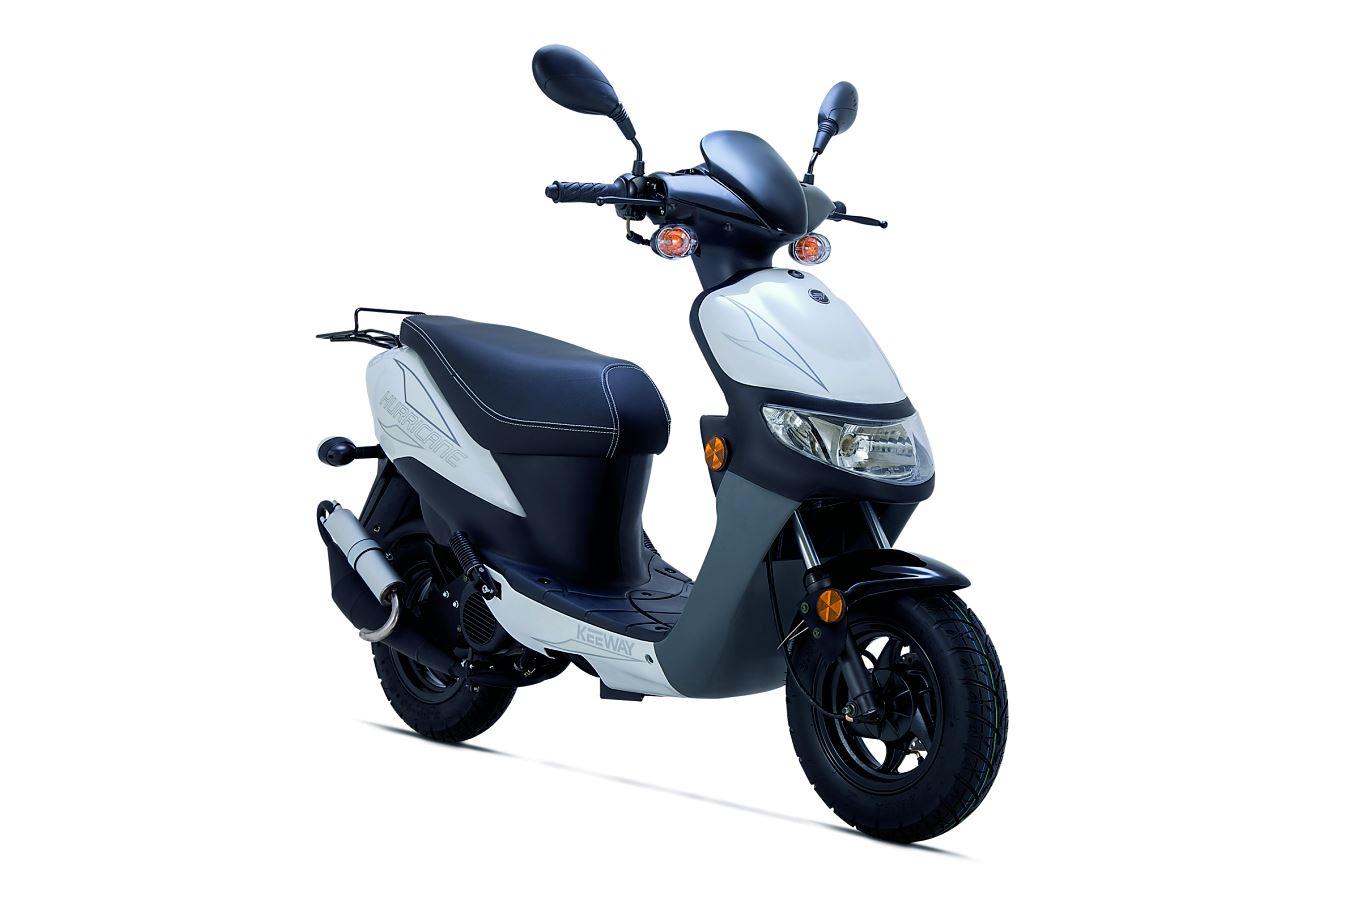 keeway hurricane 50 scooter scooter 50 andar de moto. Black Bedroom Furniture Sets. Home Design Ideas